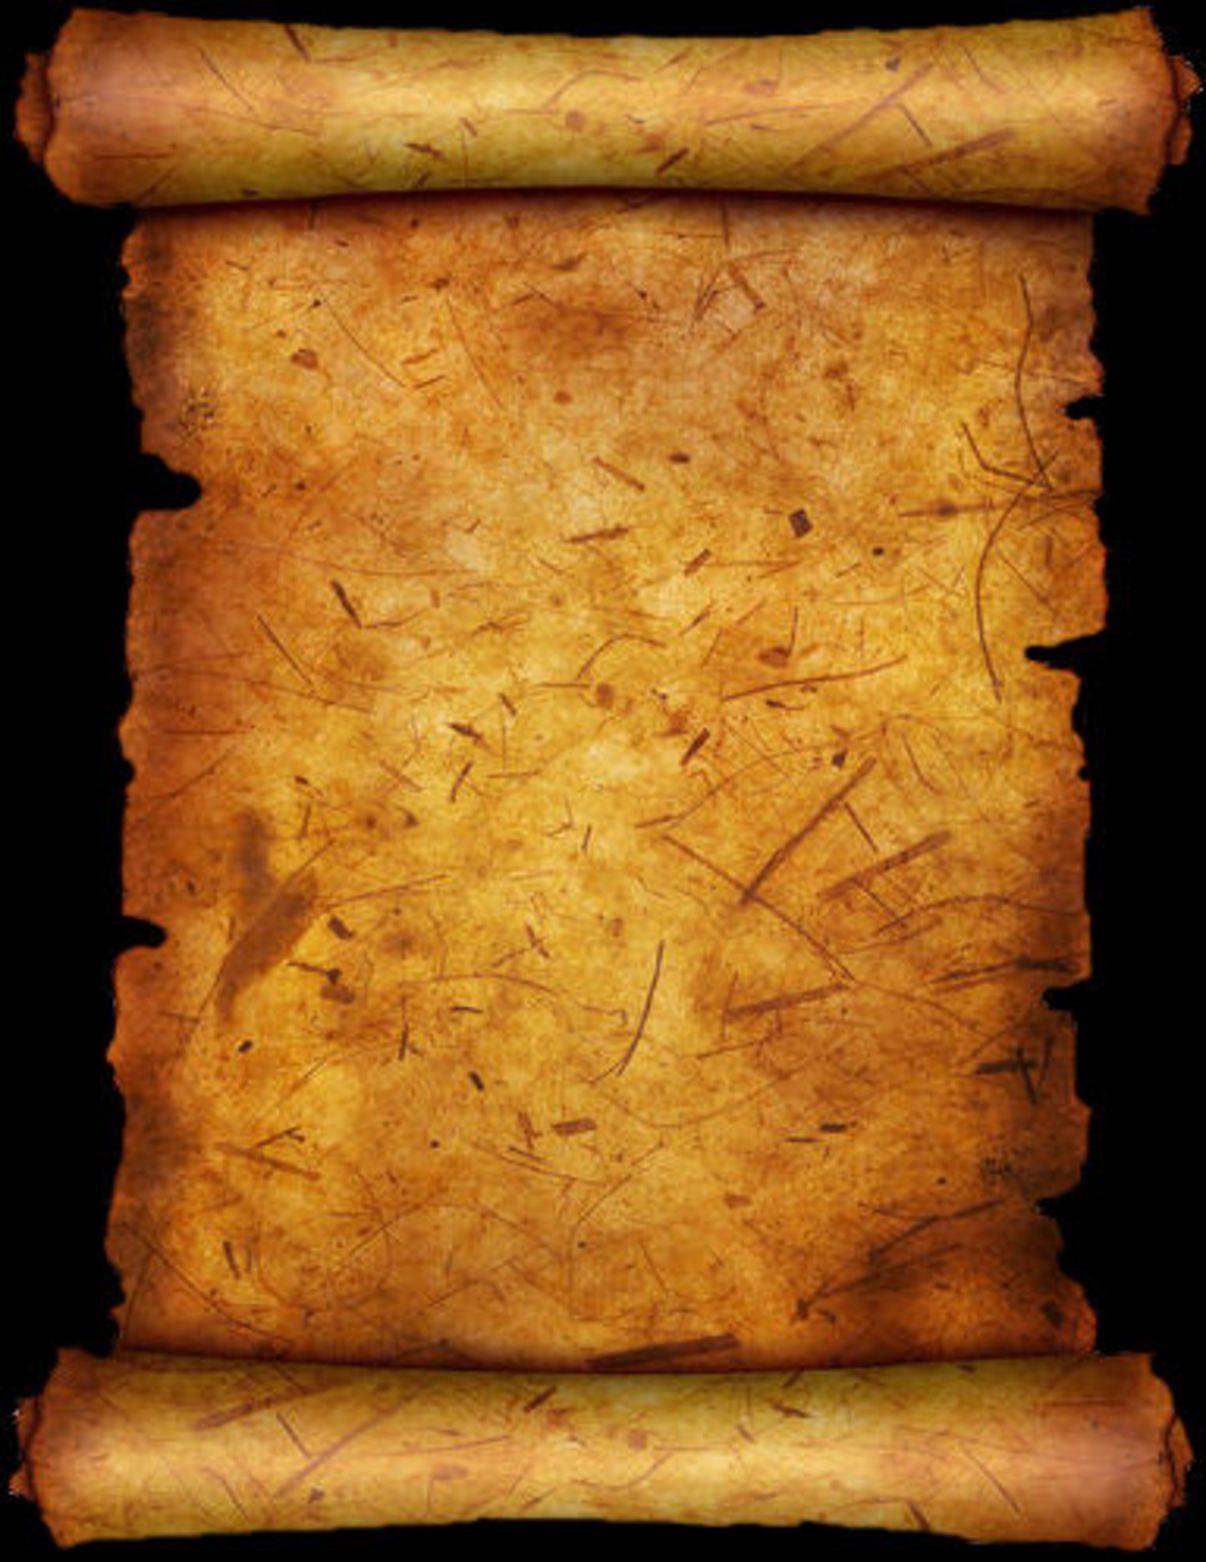 Rsultats de recherche dimages pour blank egyptian papyrus parchment scroll free printable invitations backgrounds or frames toneelgroepblik Gallery